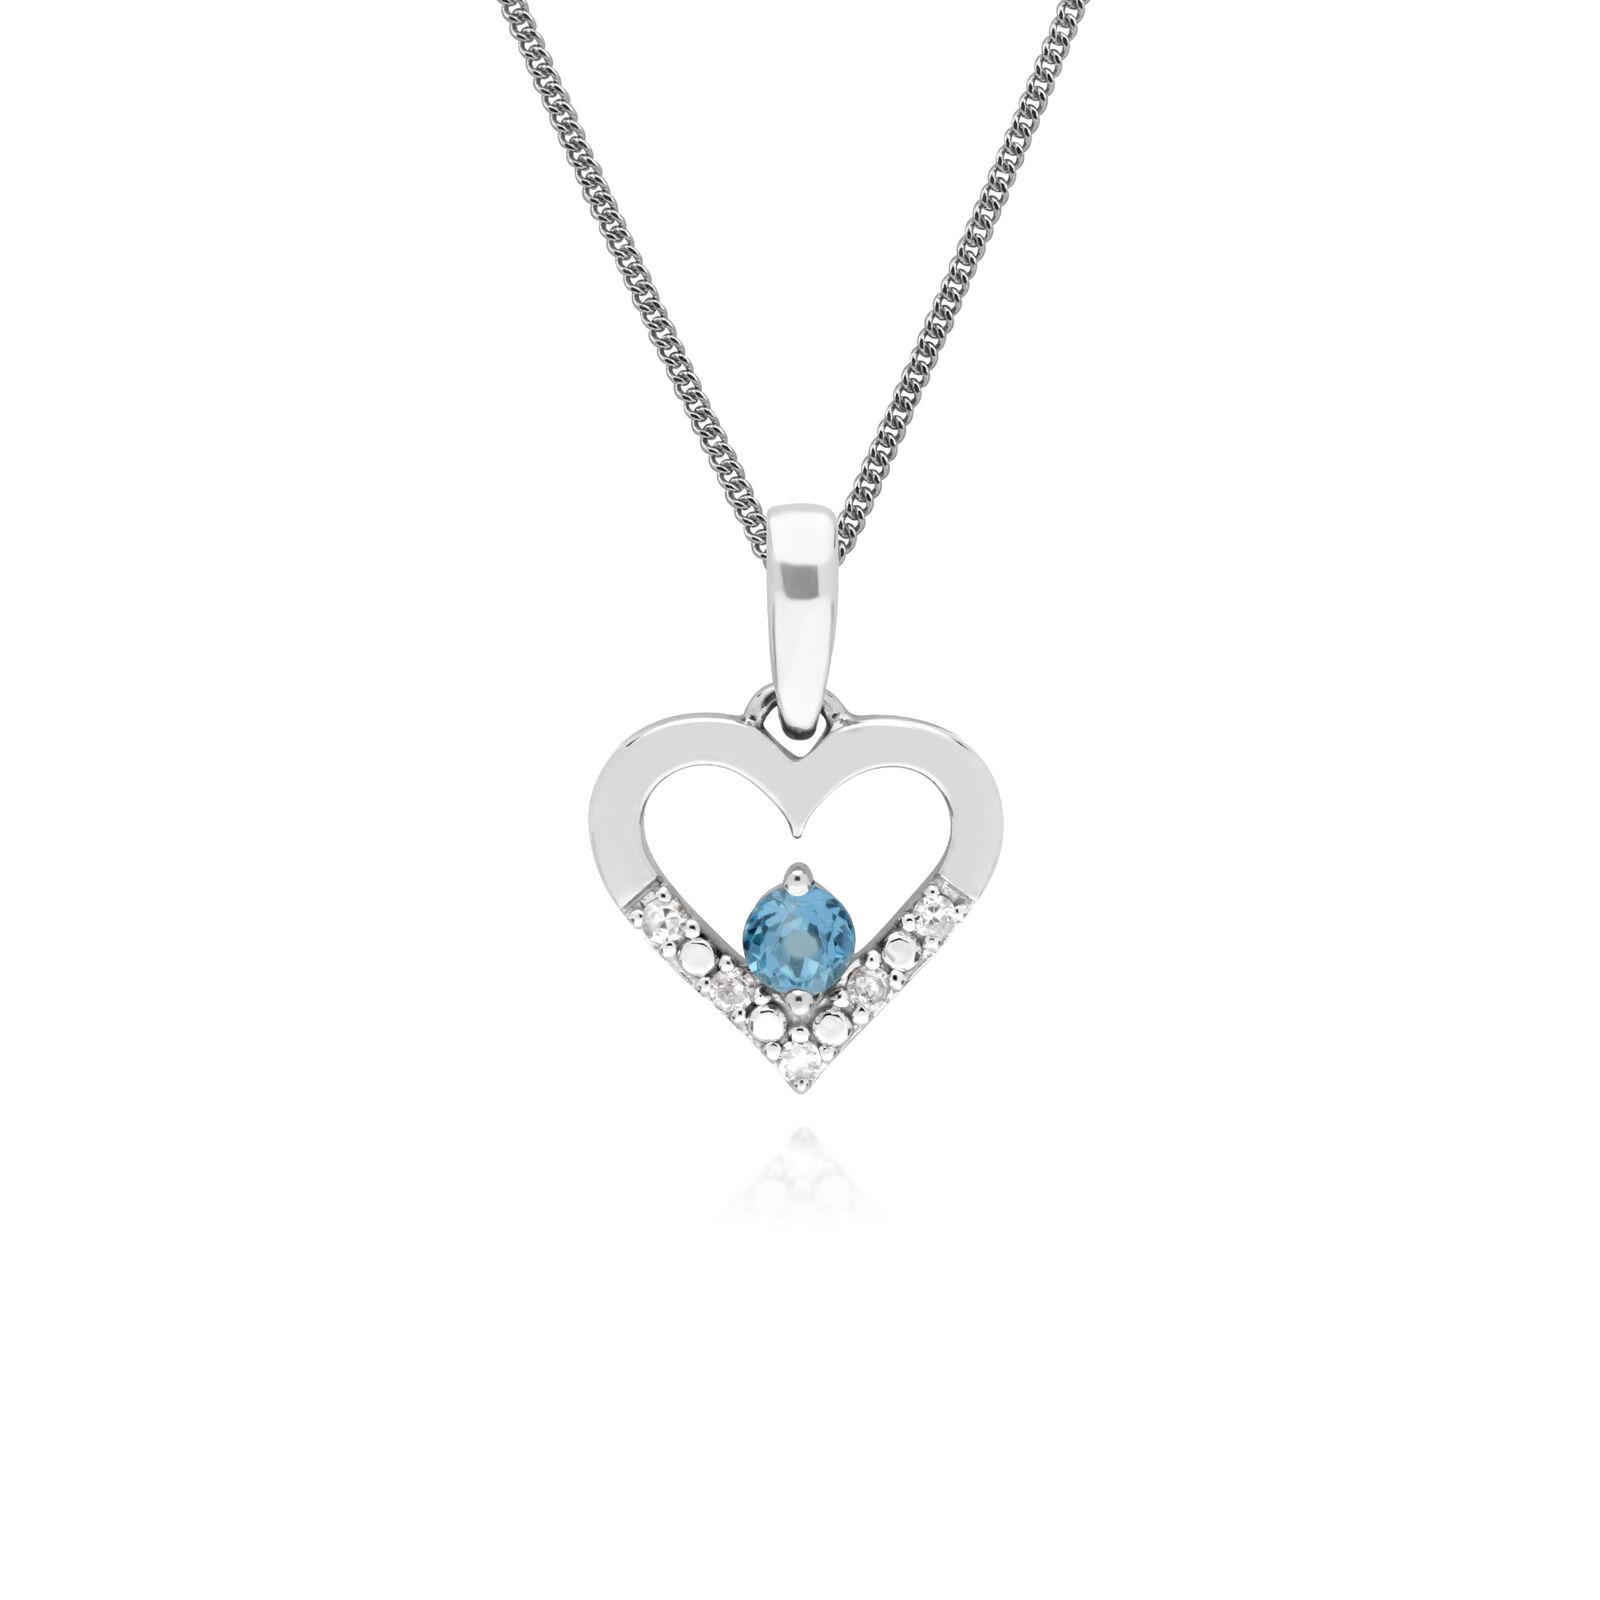 Gemondo 9ct White gold Single bluee Topaz & Diamond Heart Pendant on 45cm Chain